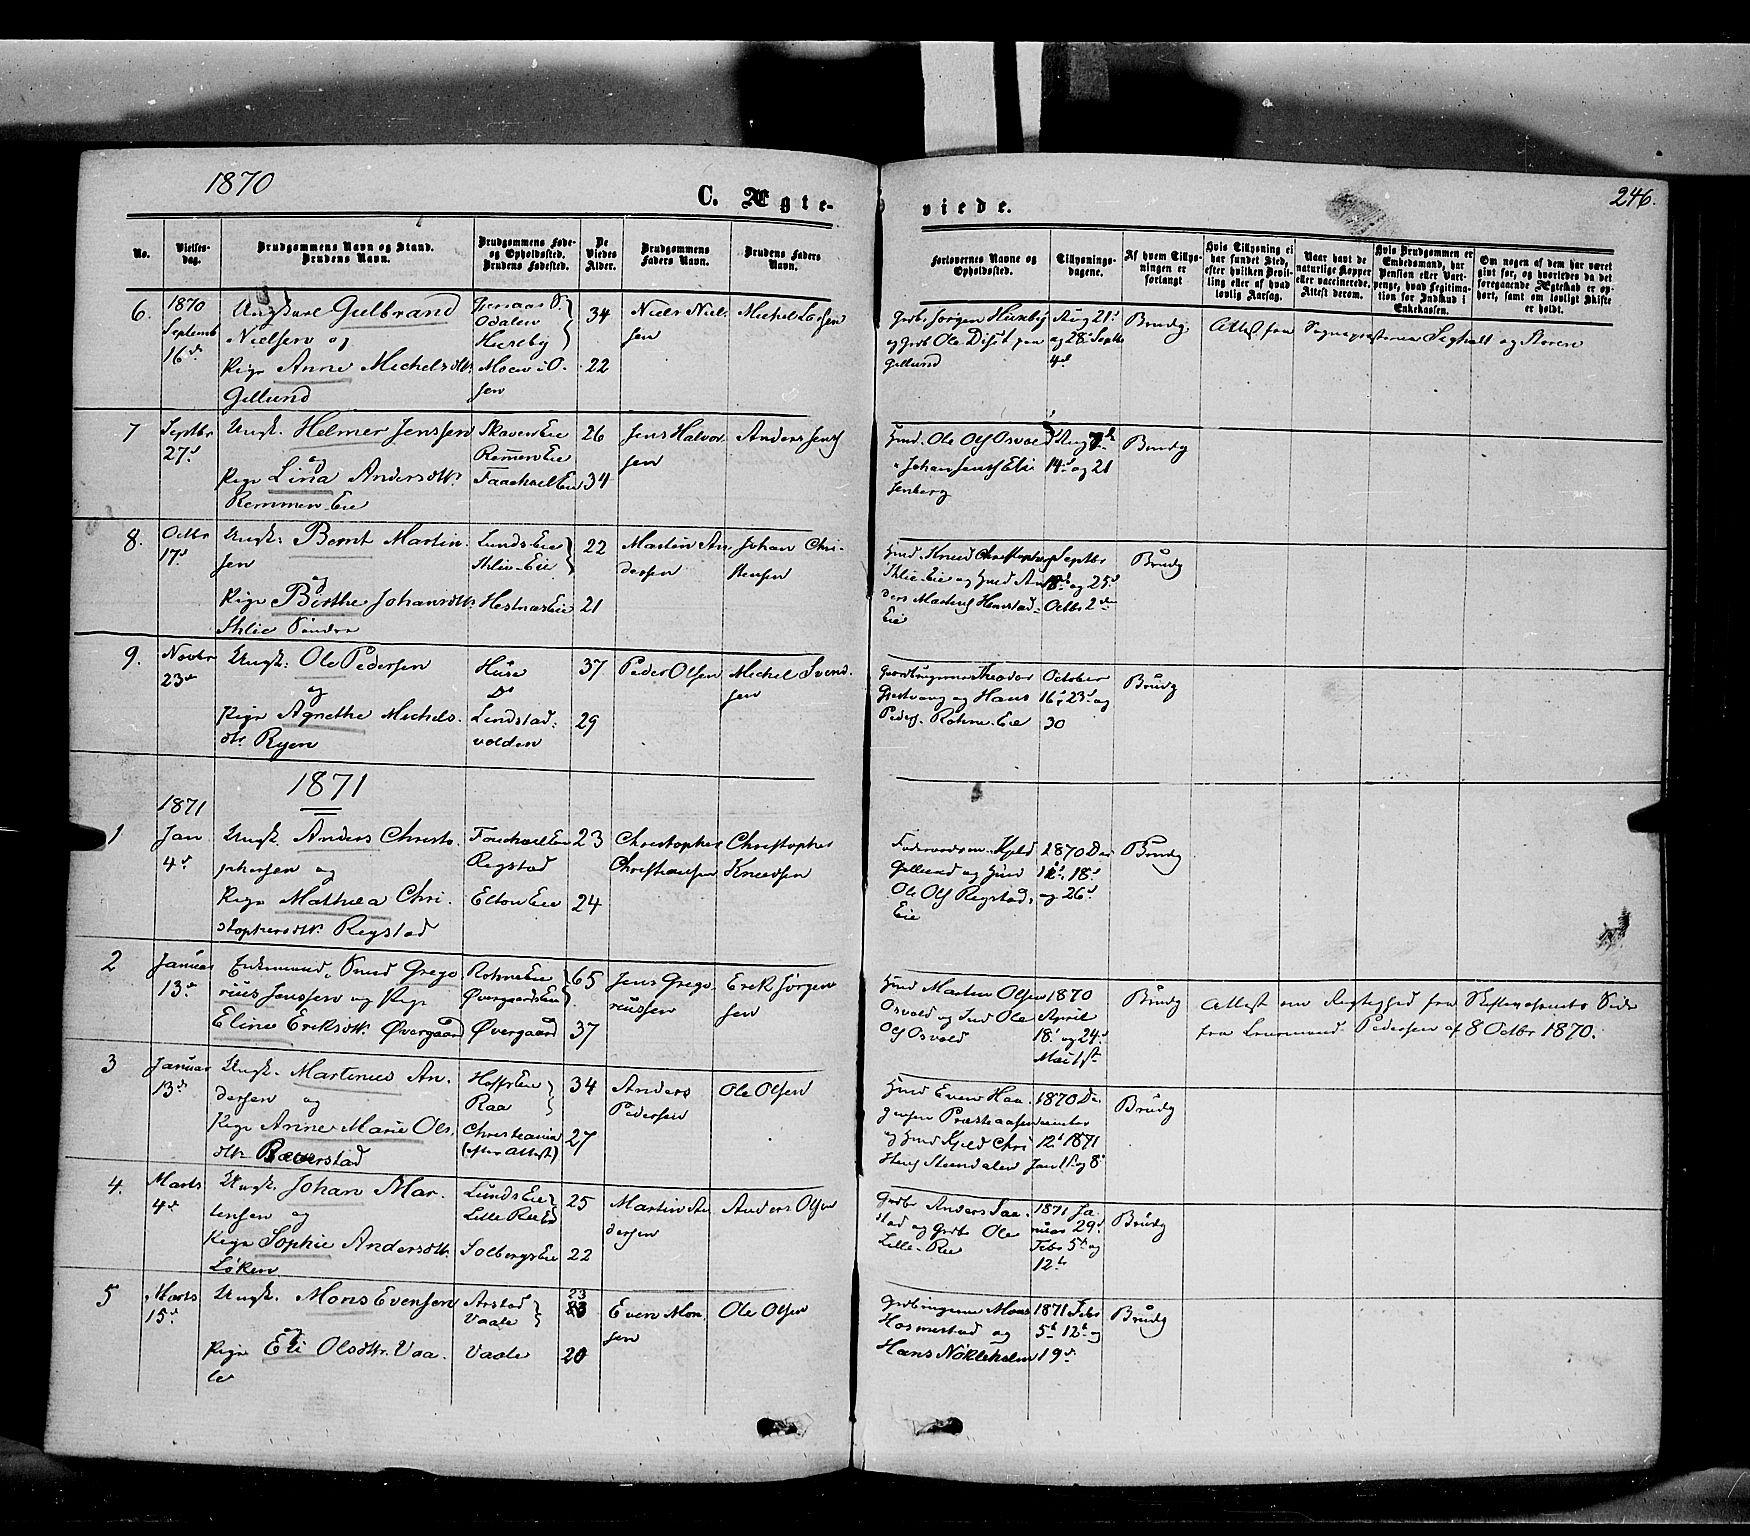 SAH, Stange prestekontor, K/L0013: Ministerialbok nr. 13, 1862-1879, s. 246